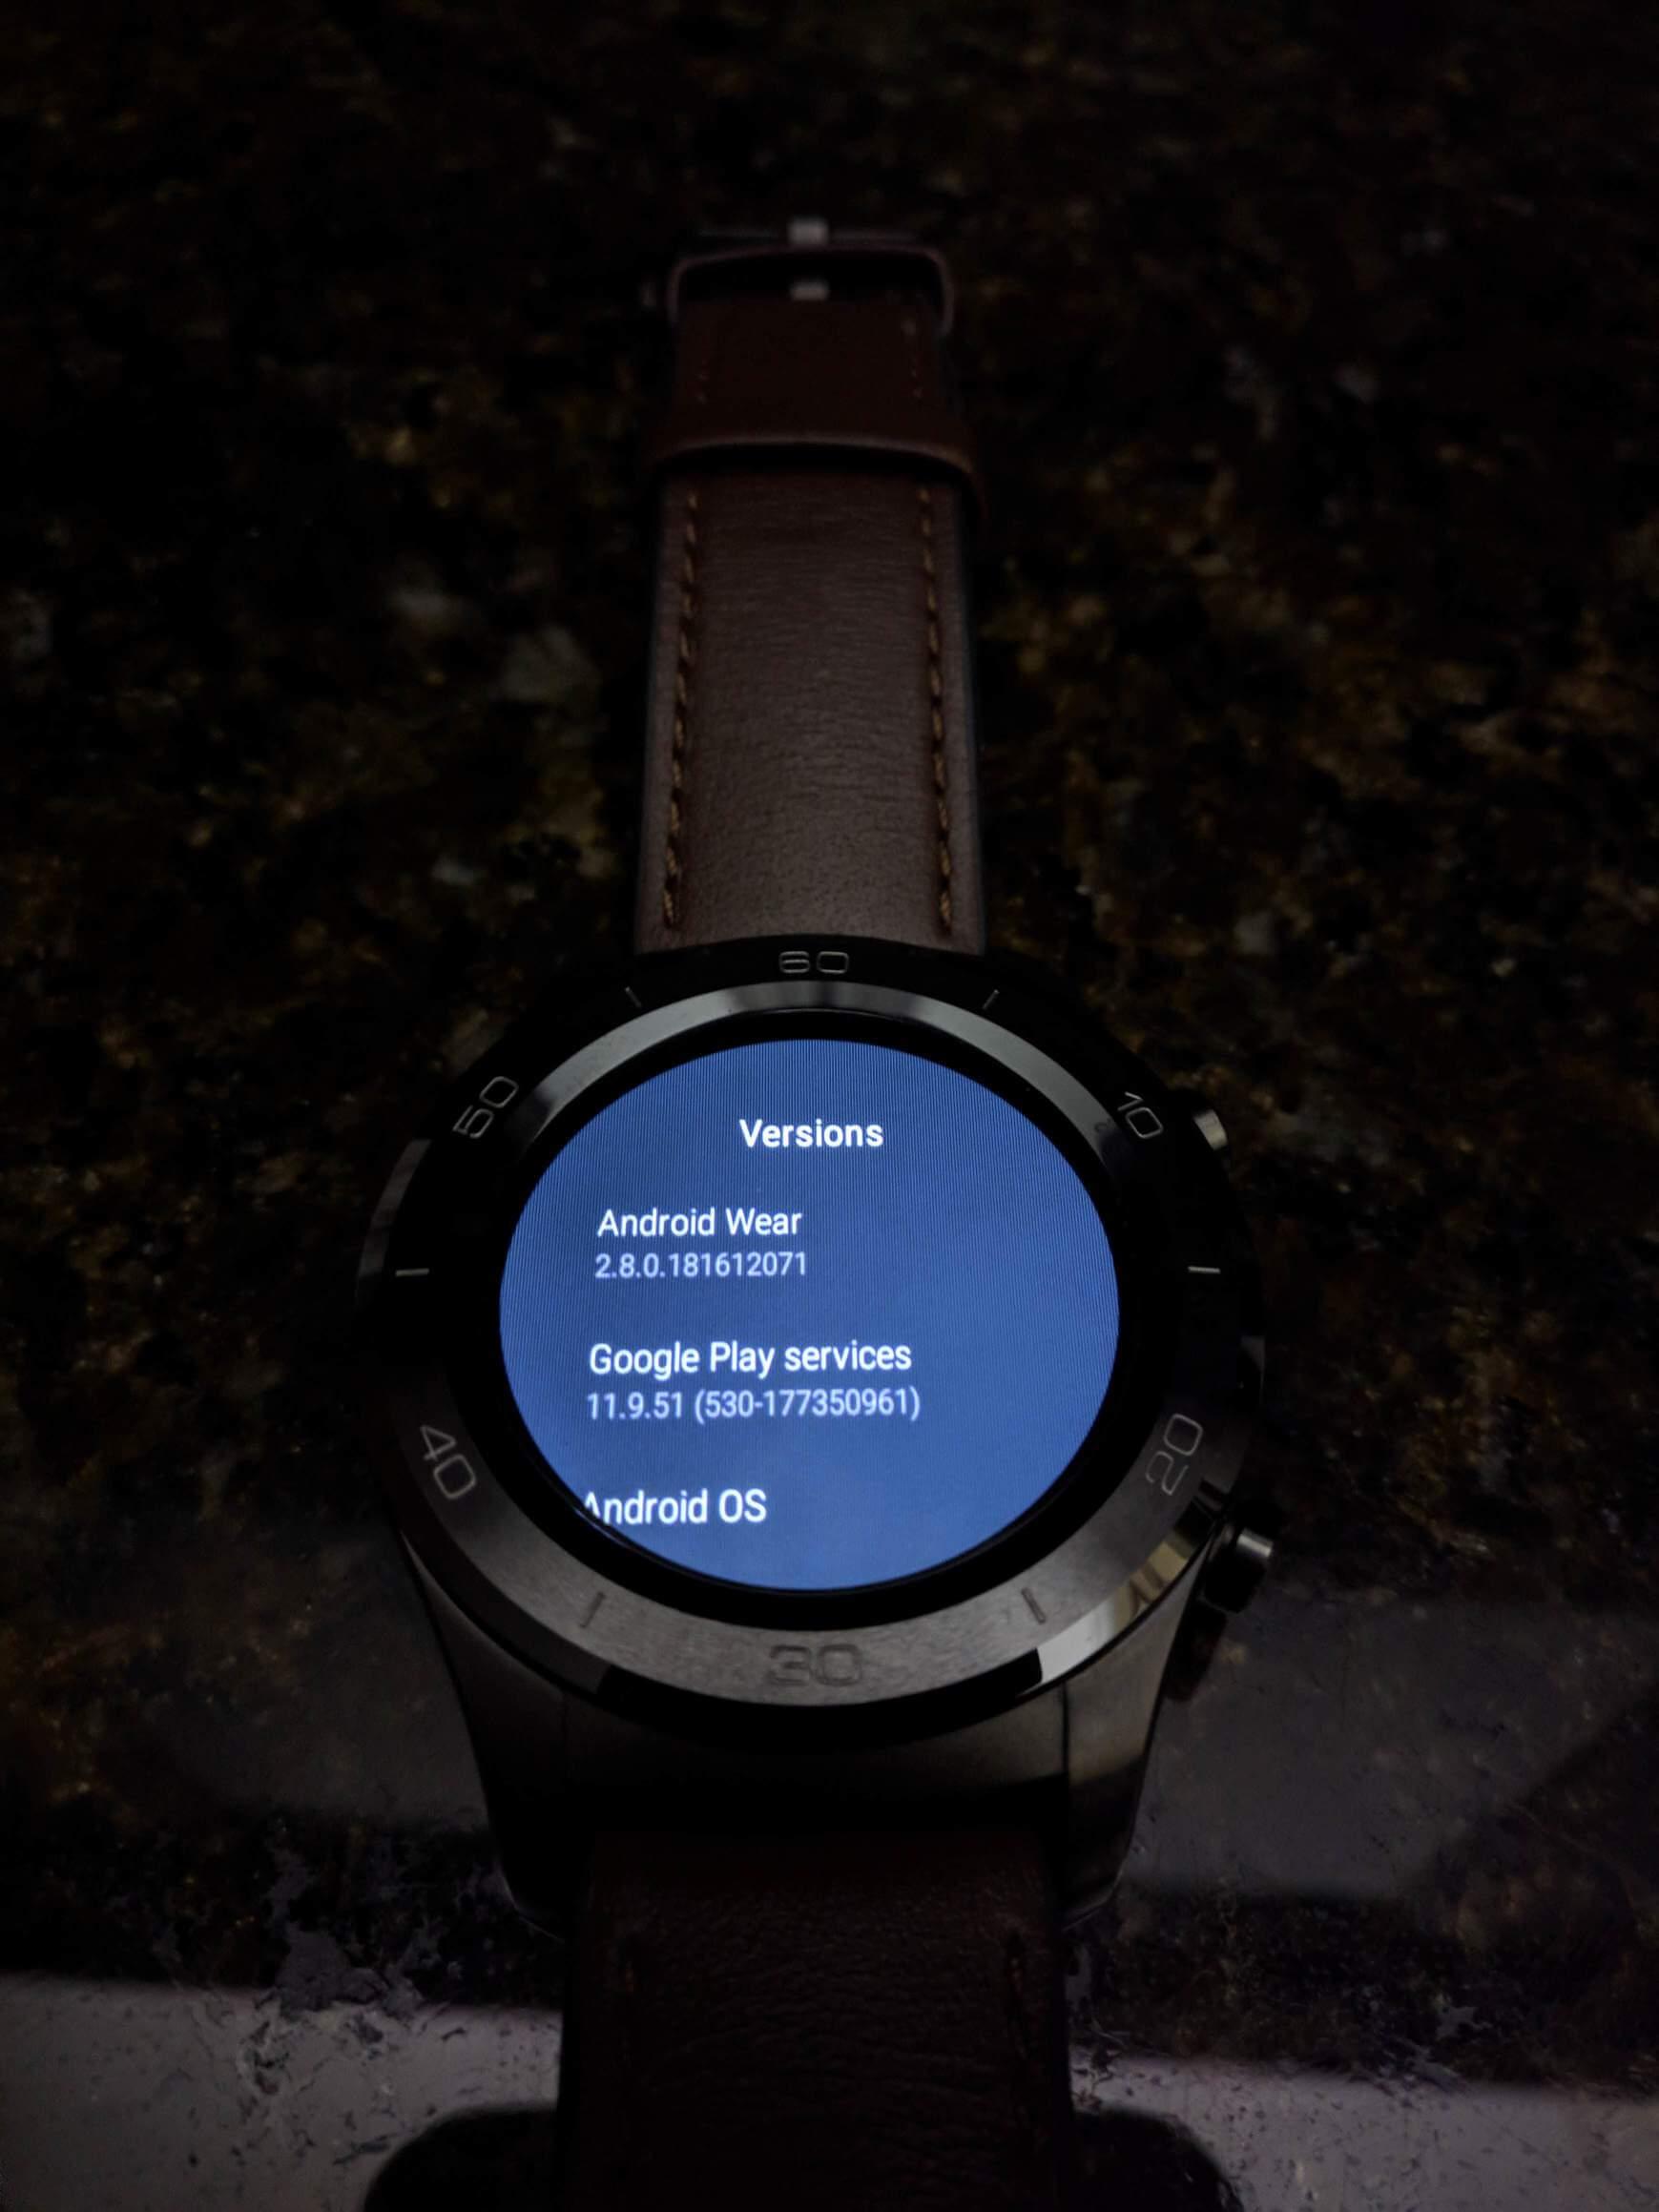 Yozakgg Reddit uploaded purported image of Android Wear 28 dark theme 02